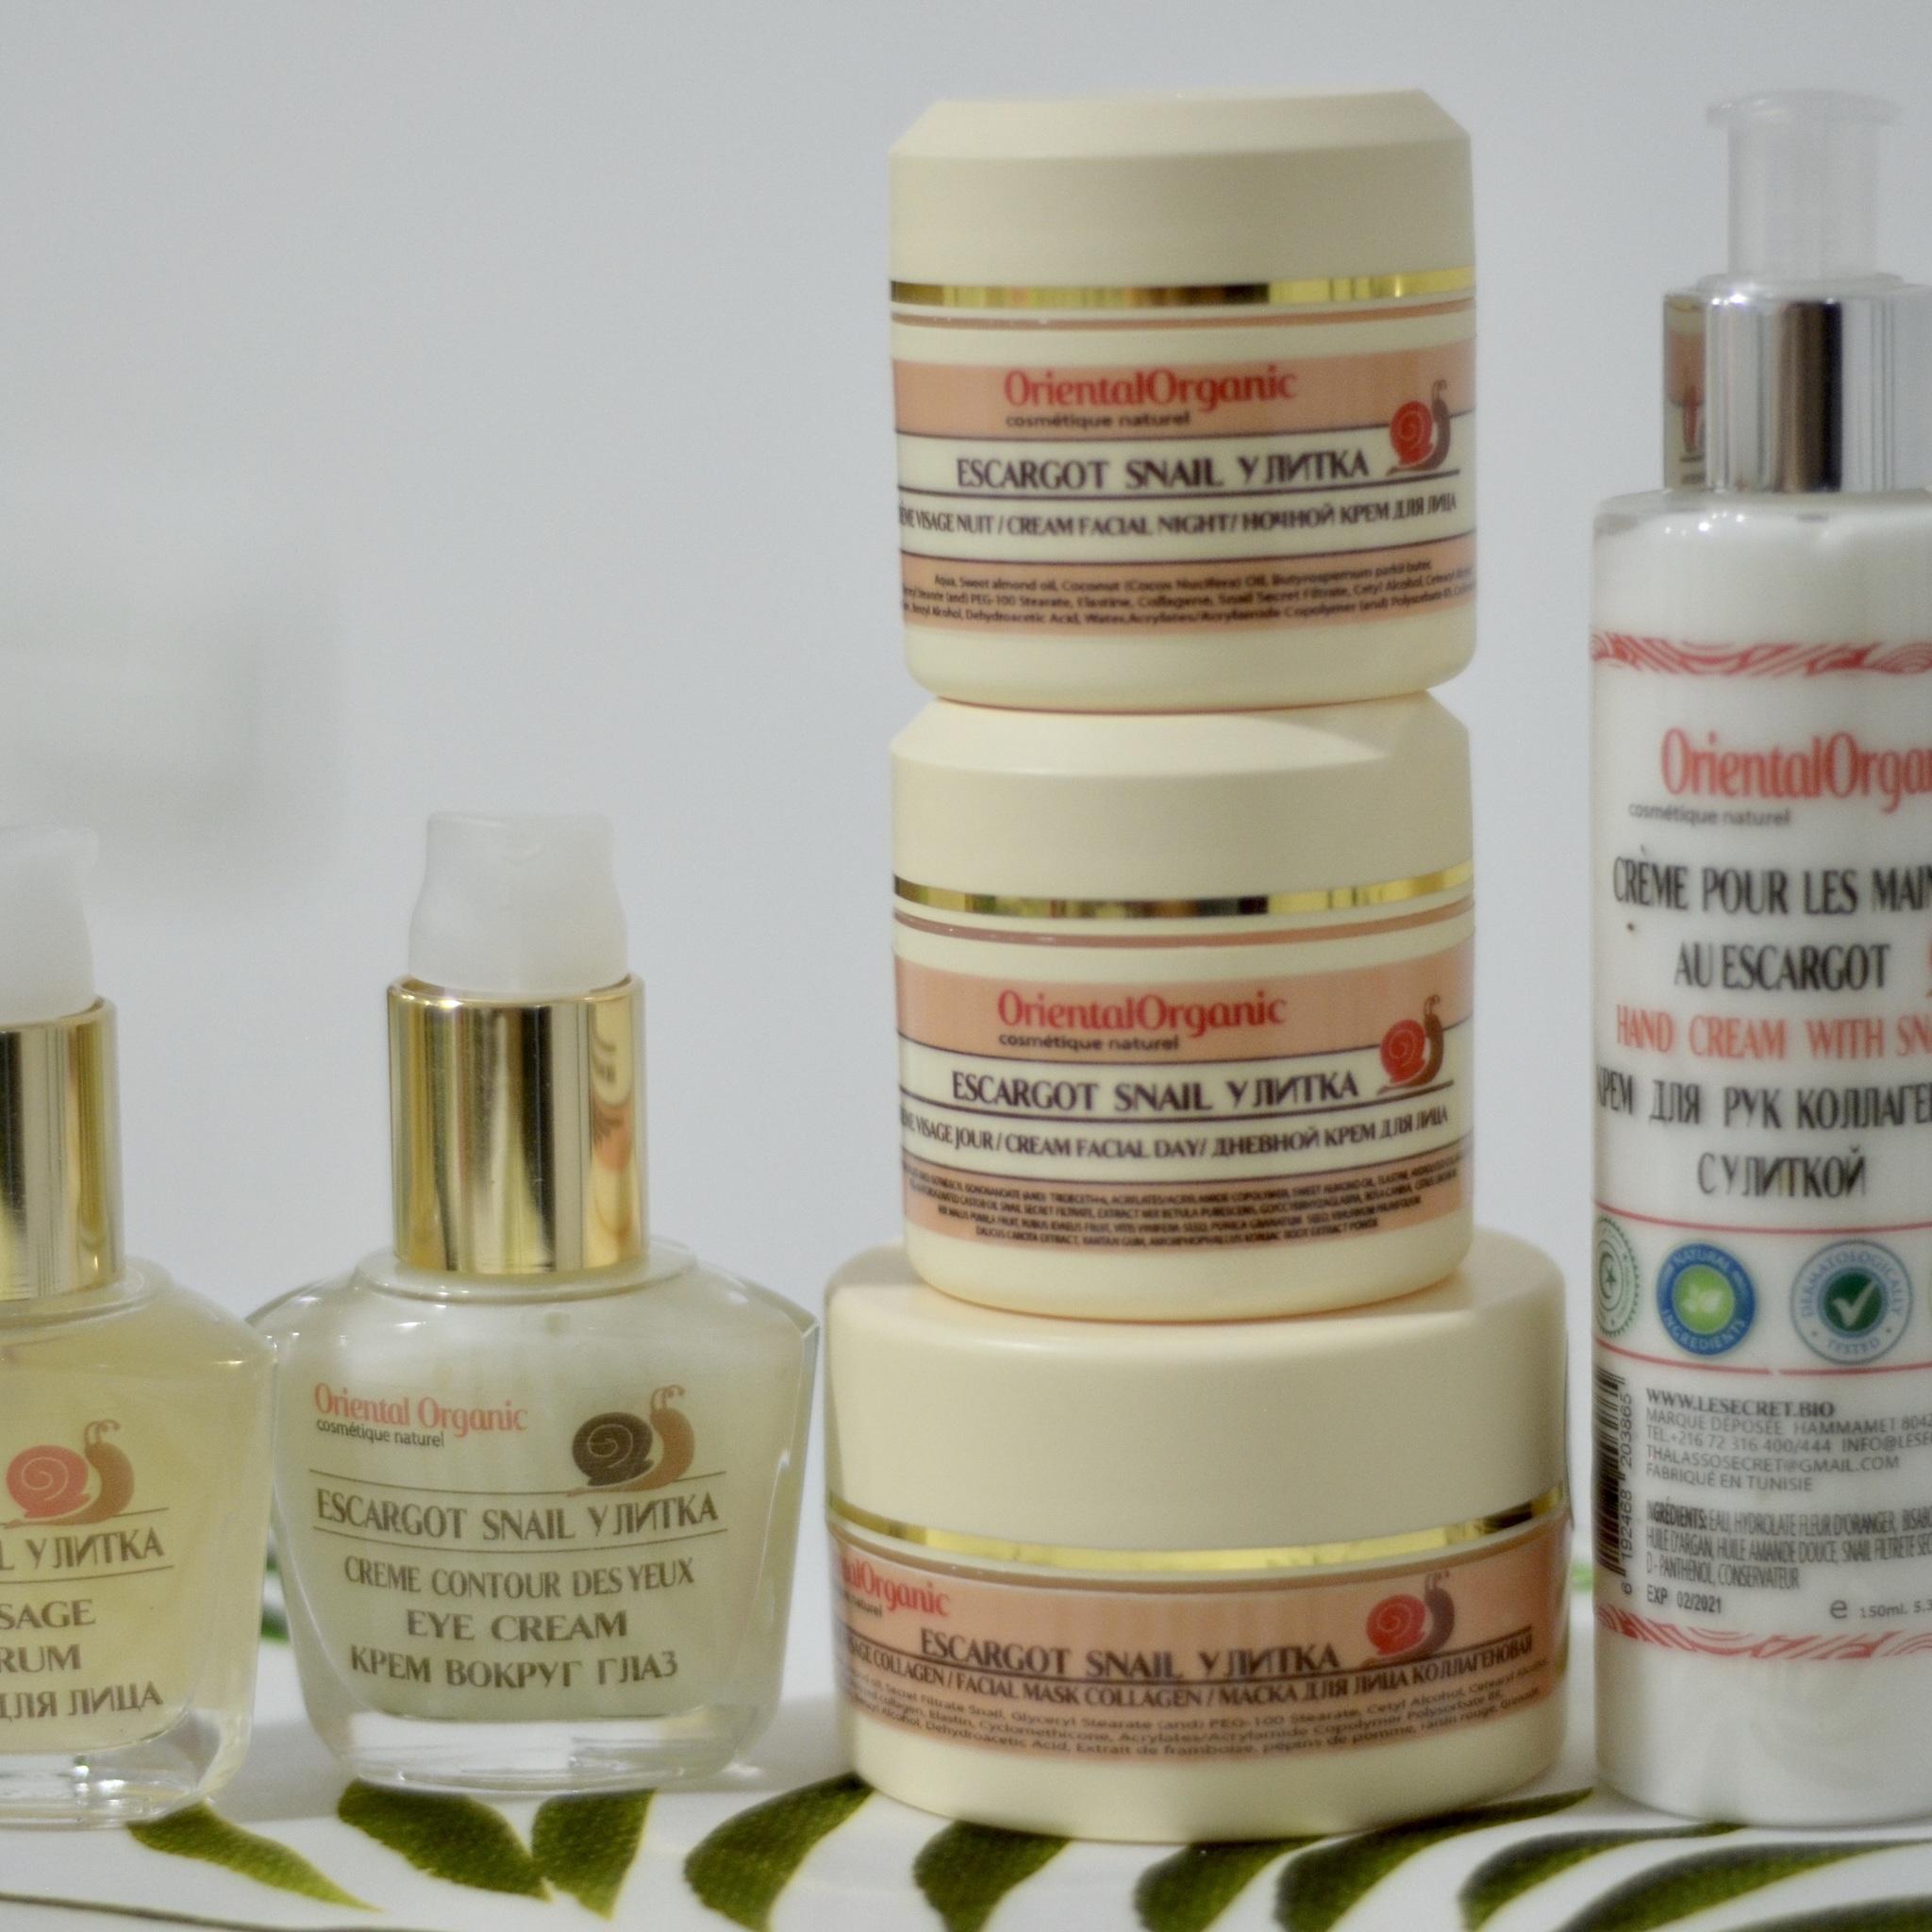 Oriental Organic Маска для лица коллагеновая с улиткой